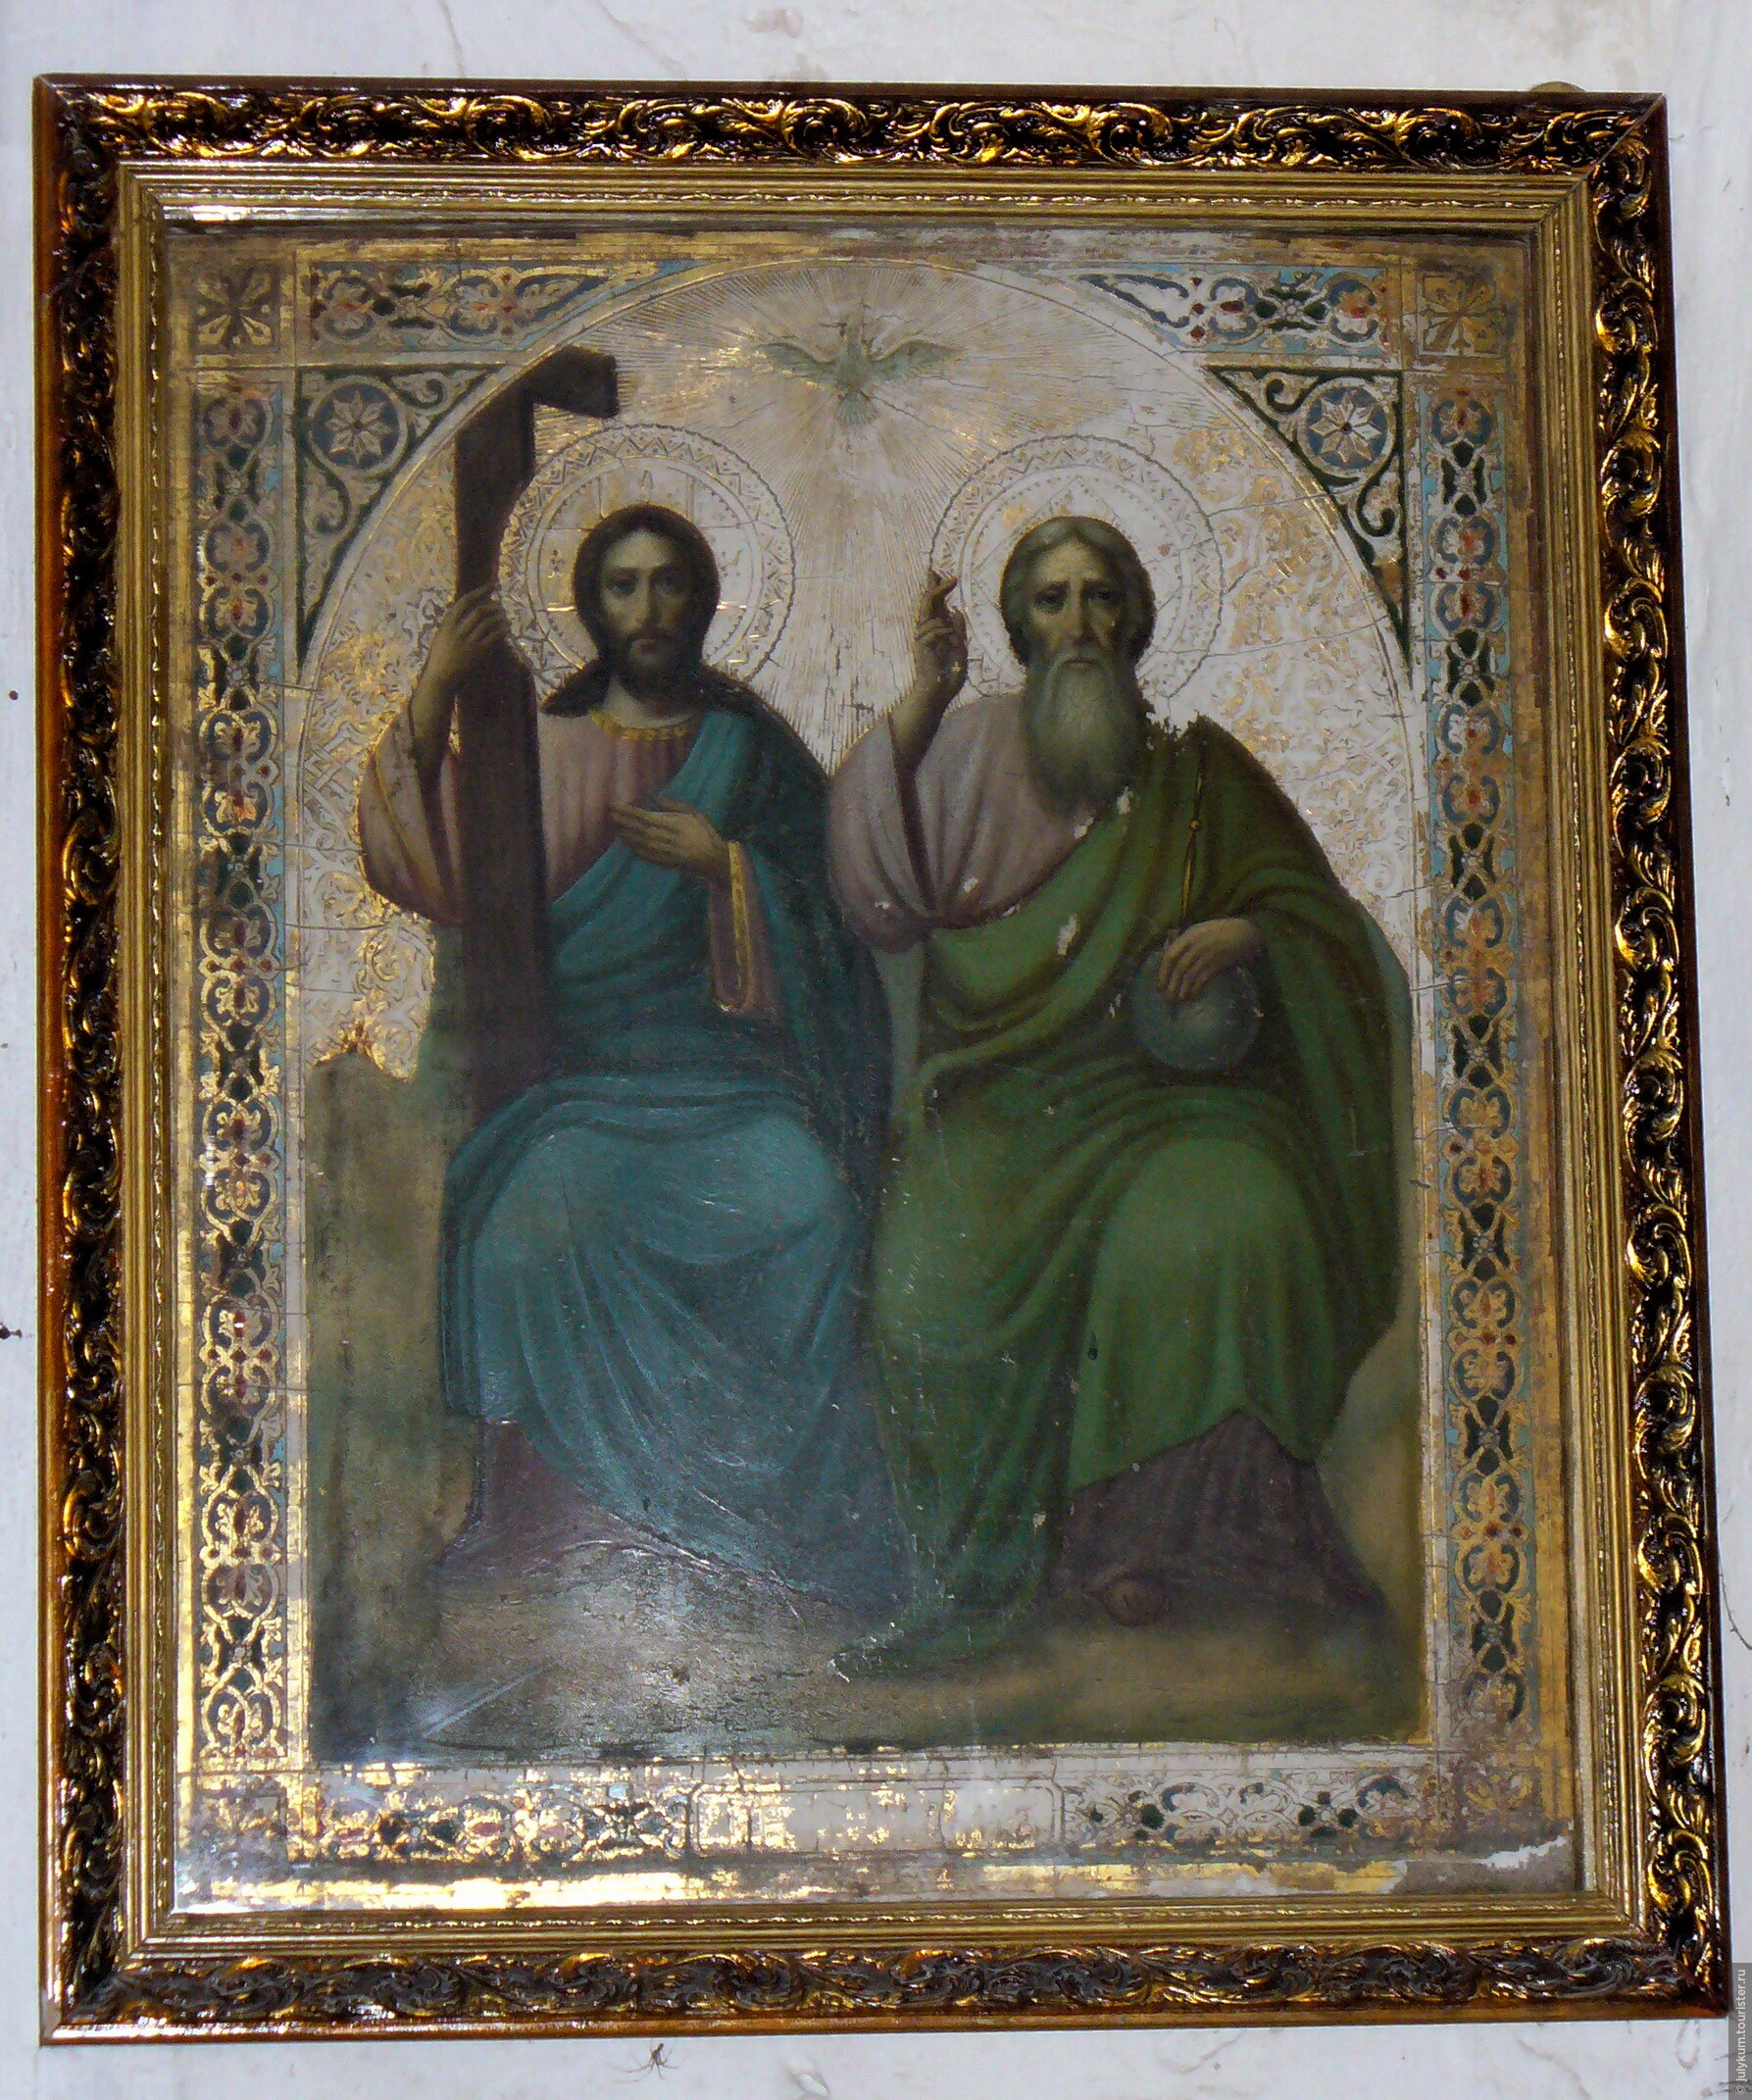 закрепления глиттера фото чудотворная икона святая троица брежнева